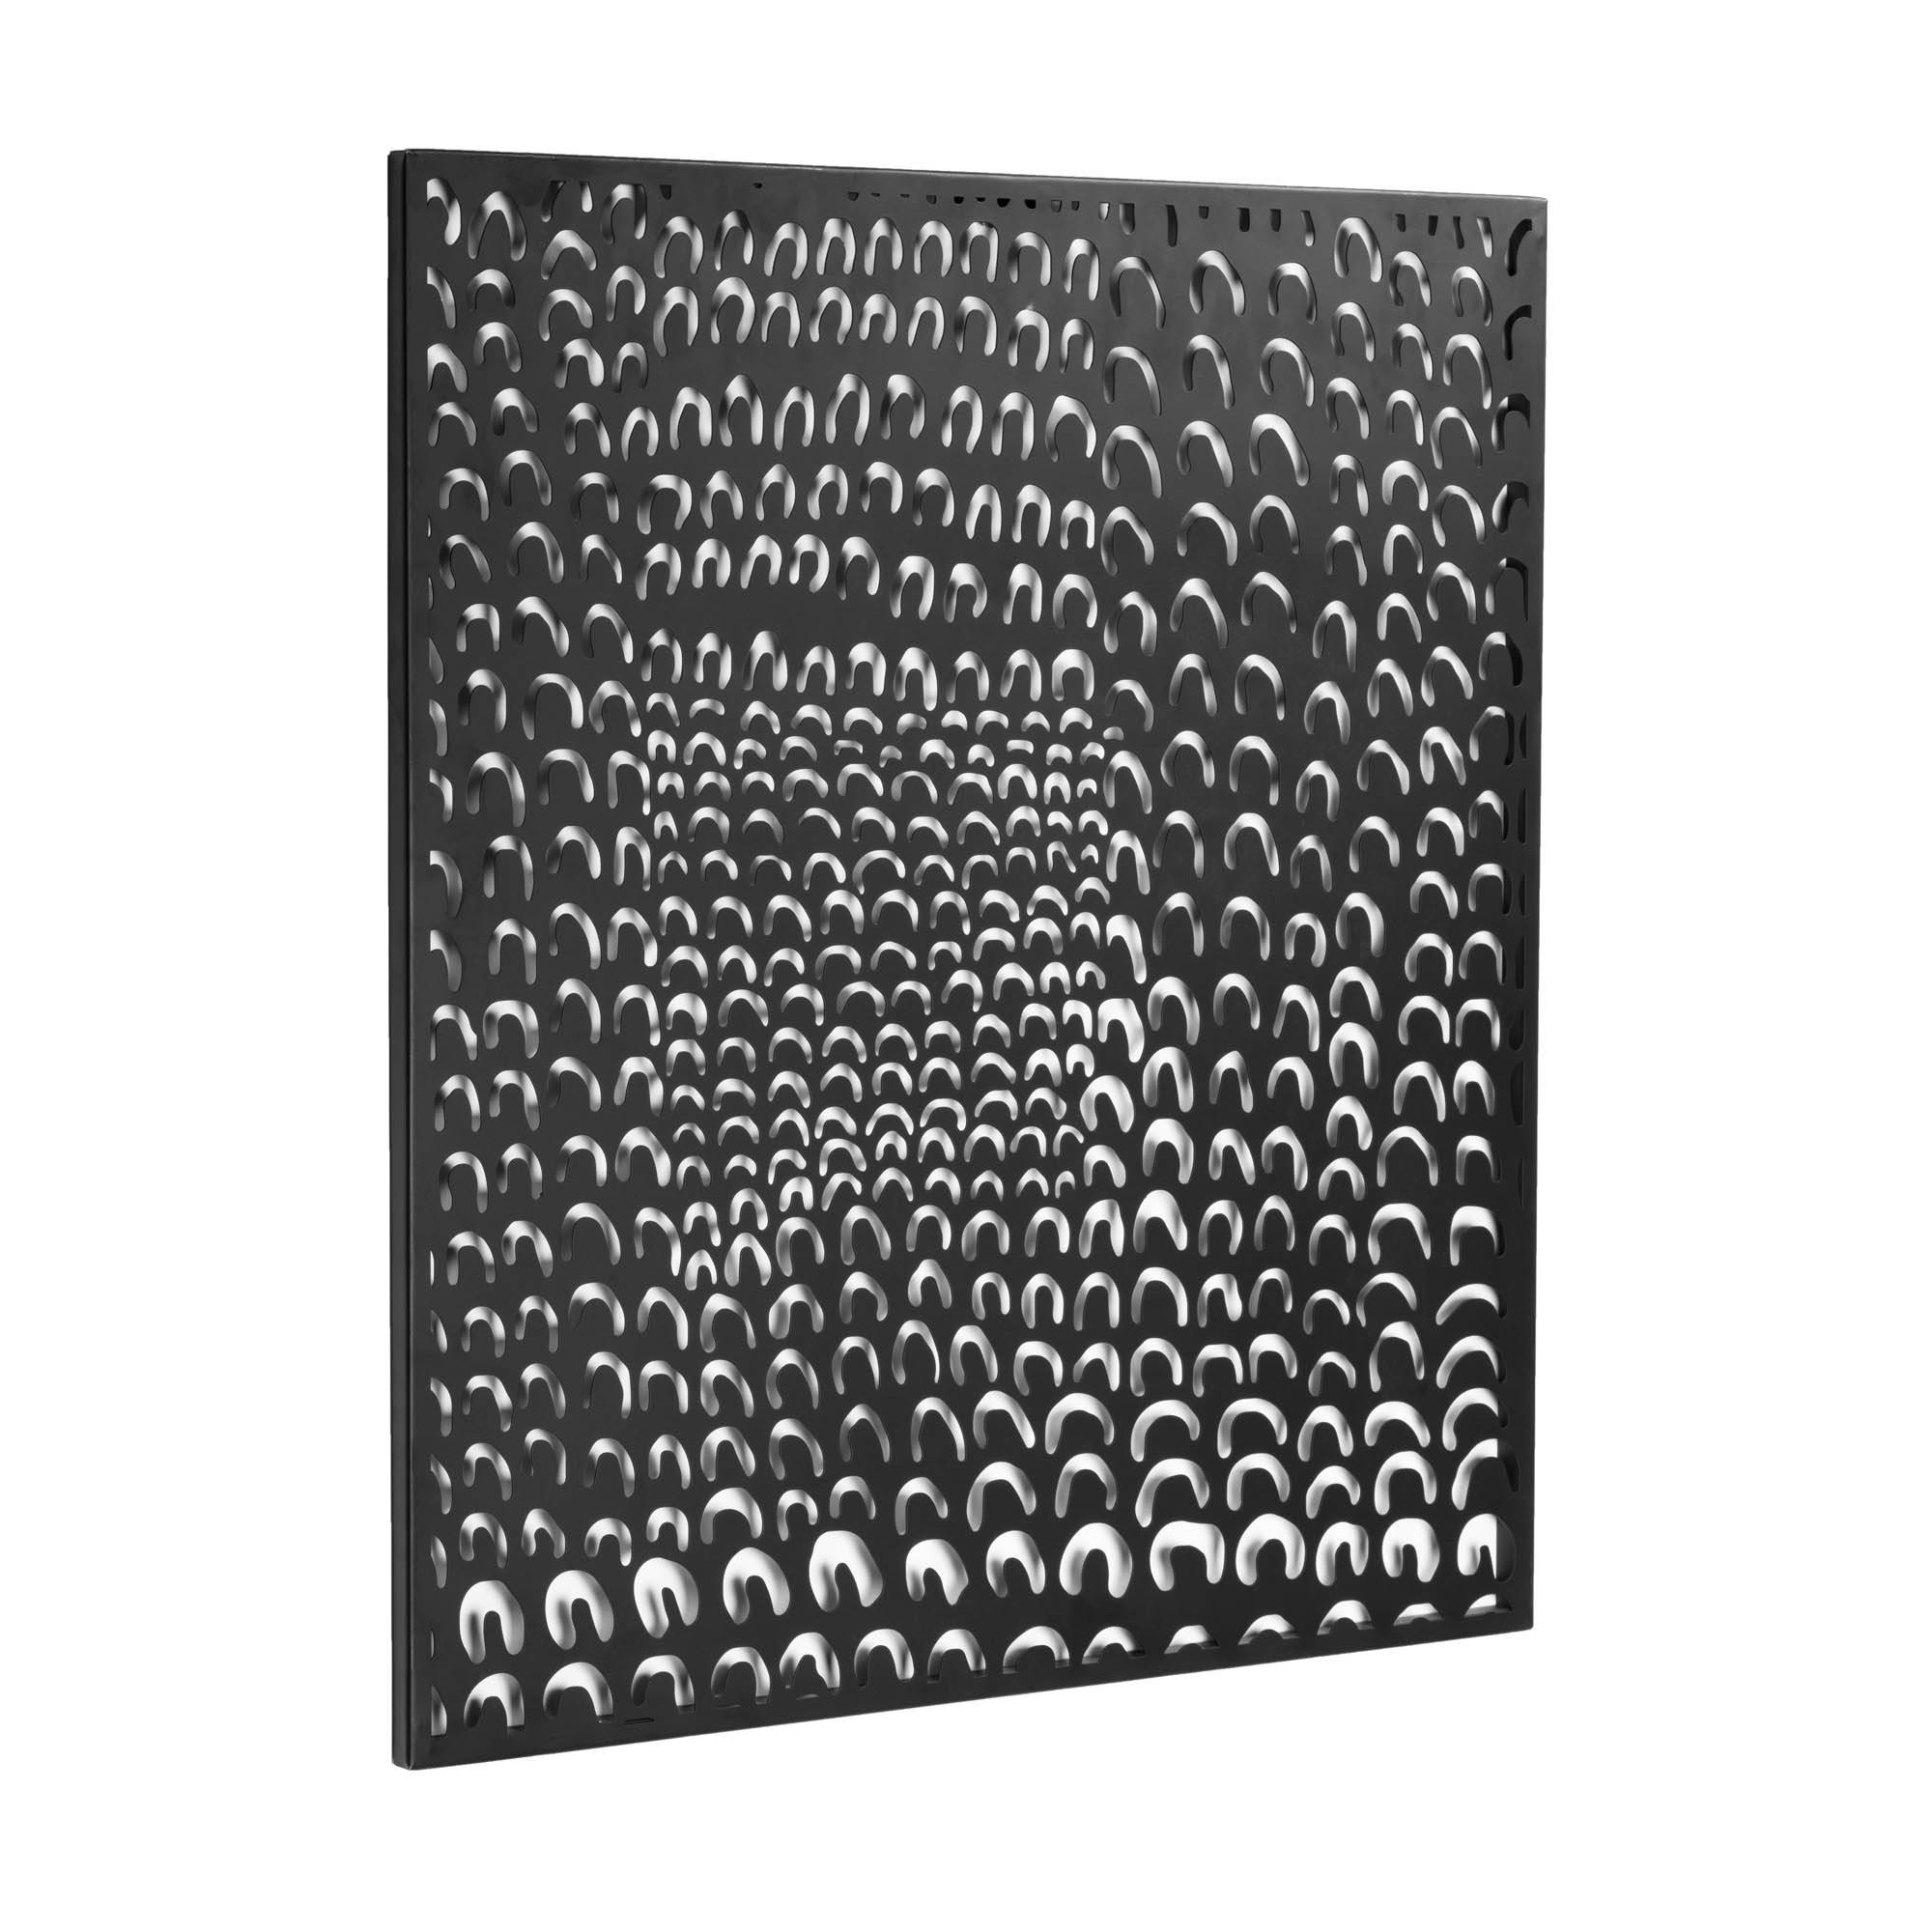 Kave Home - Cyna Wand Objekt aus Metall 60 x 74 cm